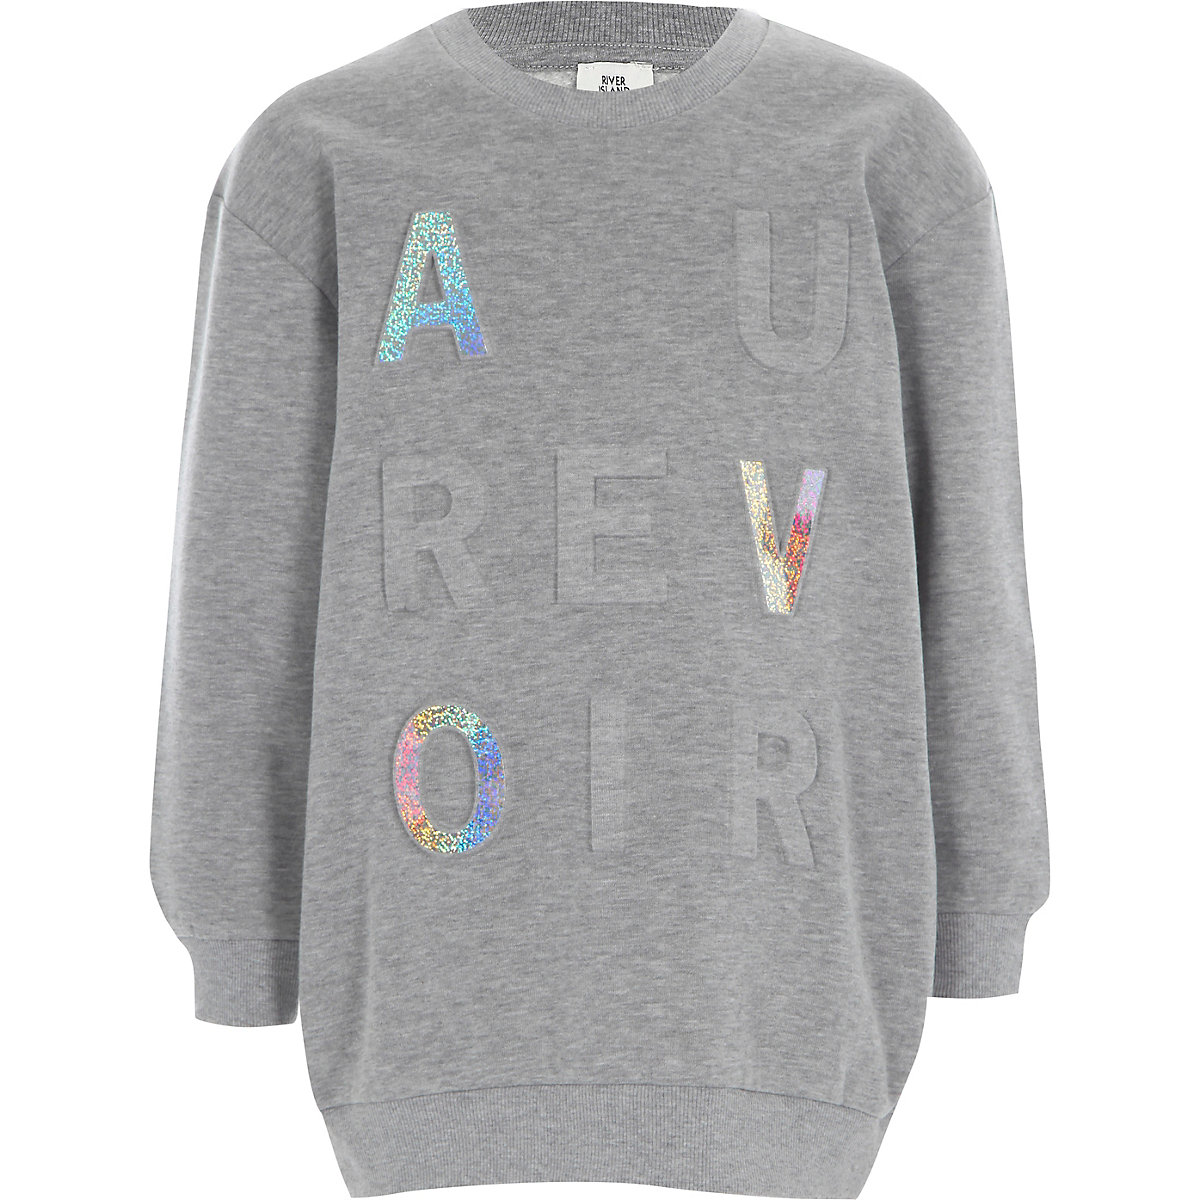 Grey 'au revoir' glitter foil sweatshirt